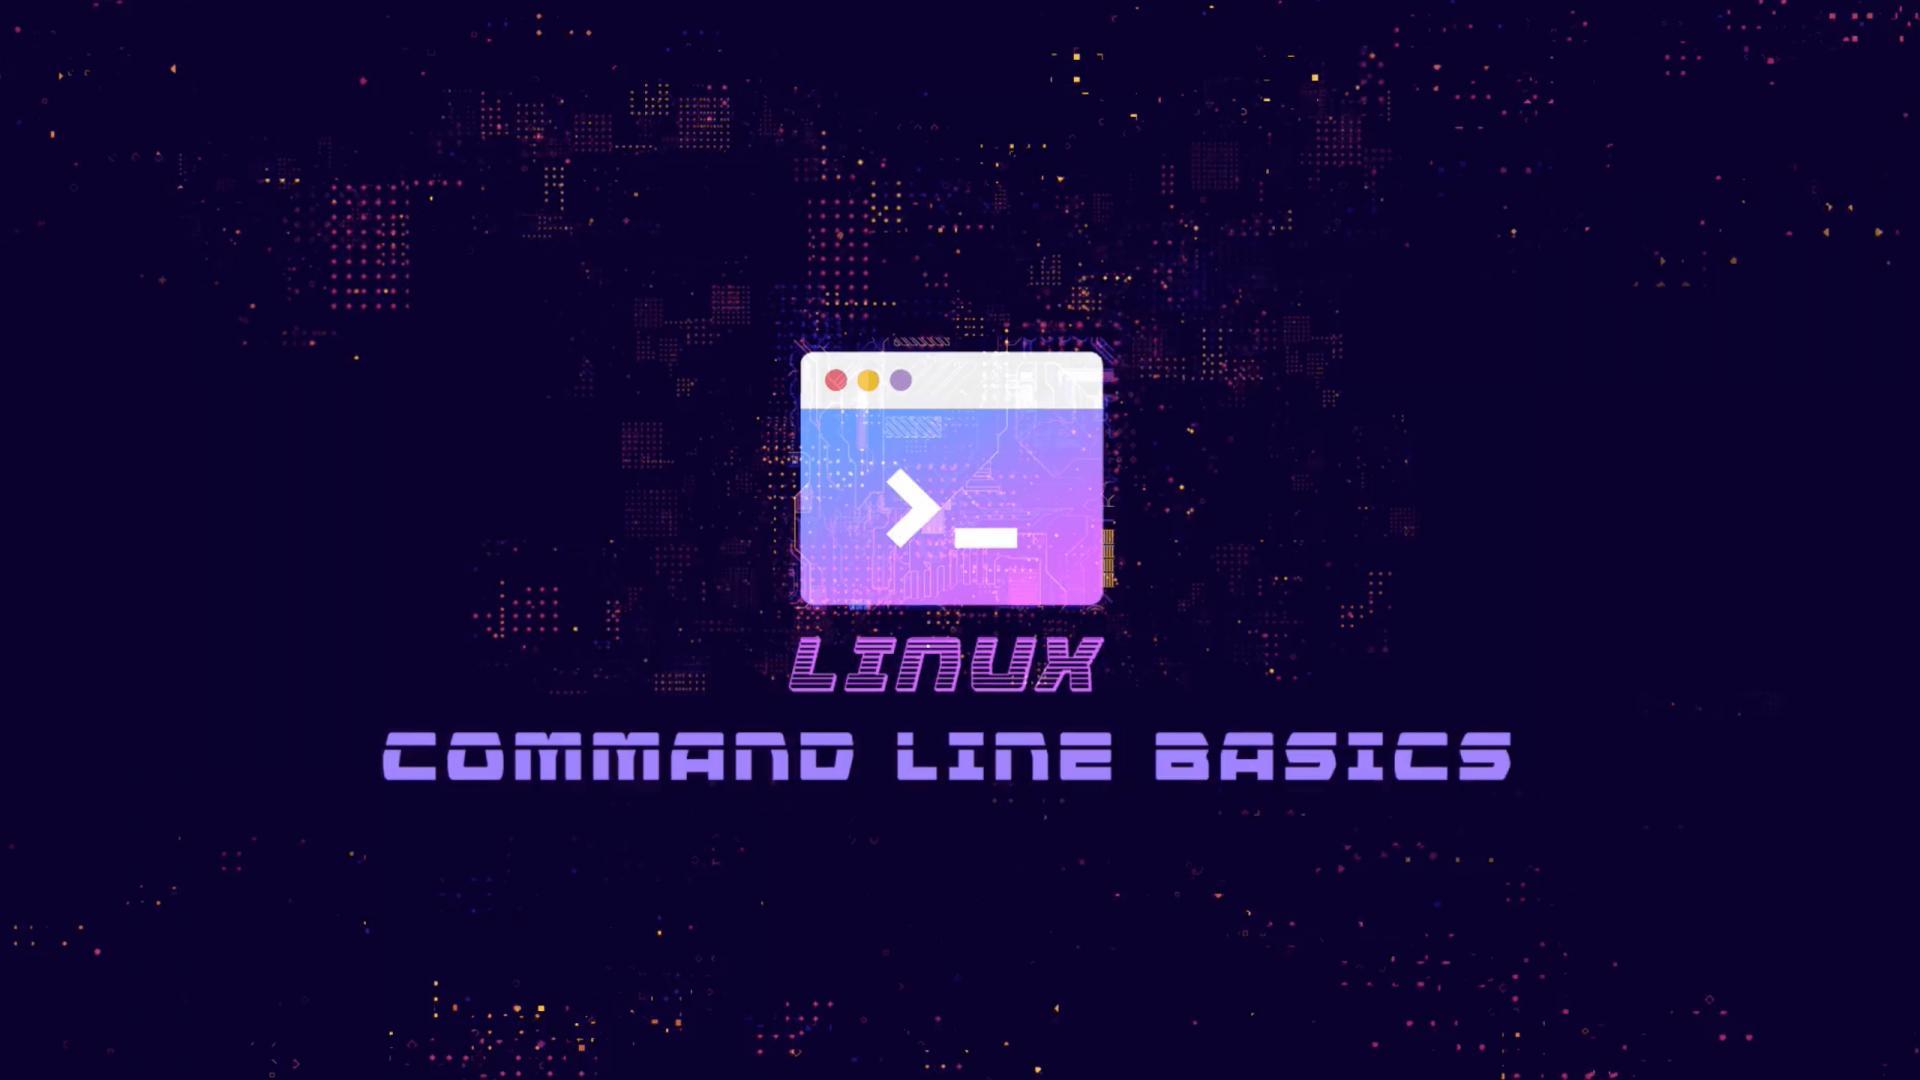 Linux Command Line Basics